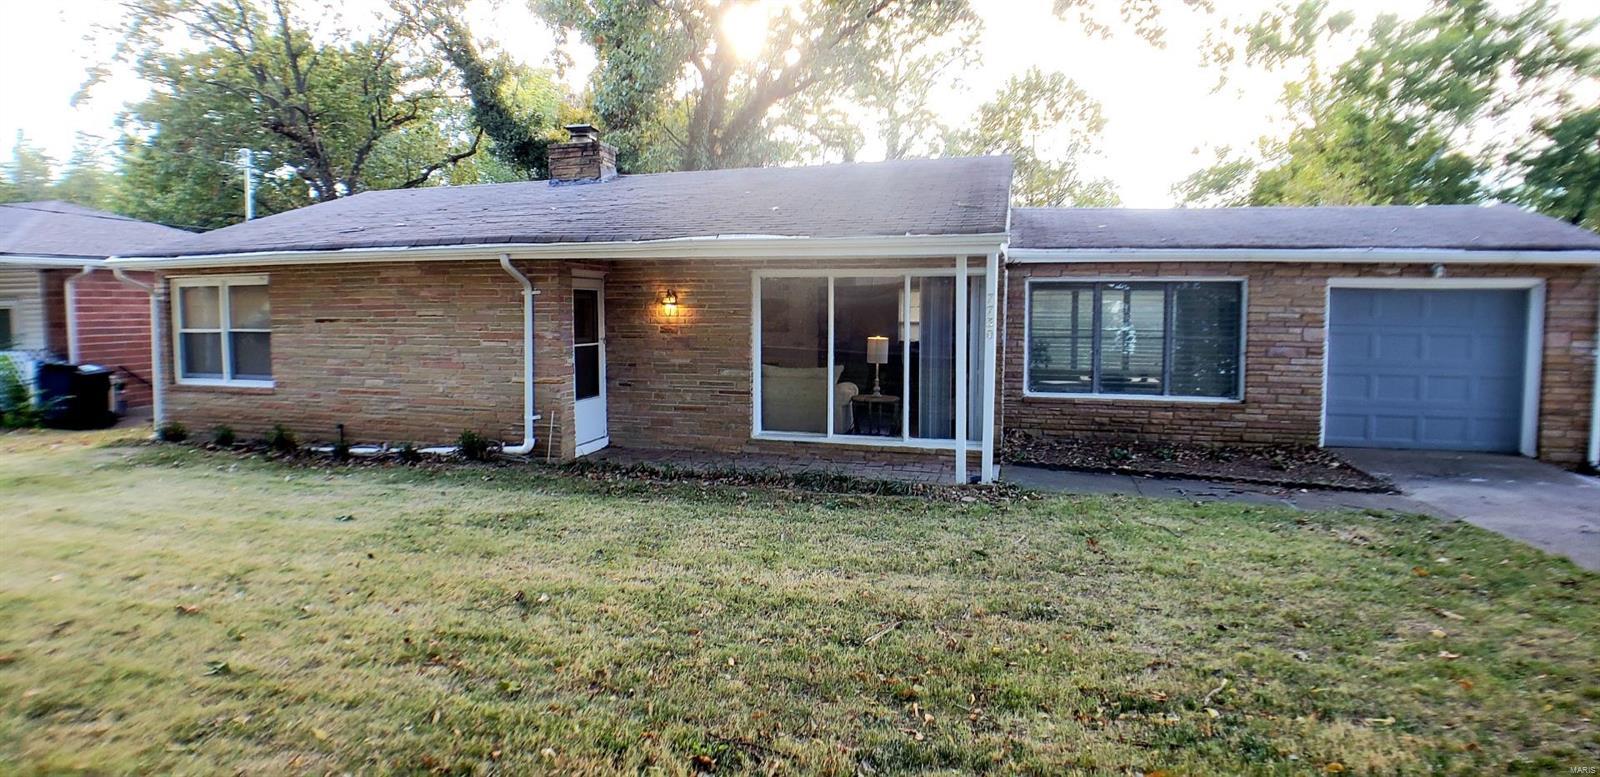 7730 Circle Drive Property Photo - St Louis, MO real estate listing